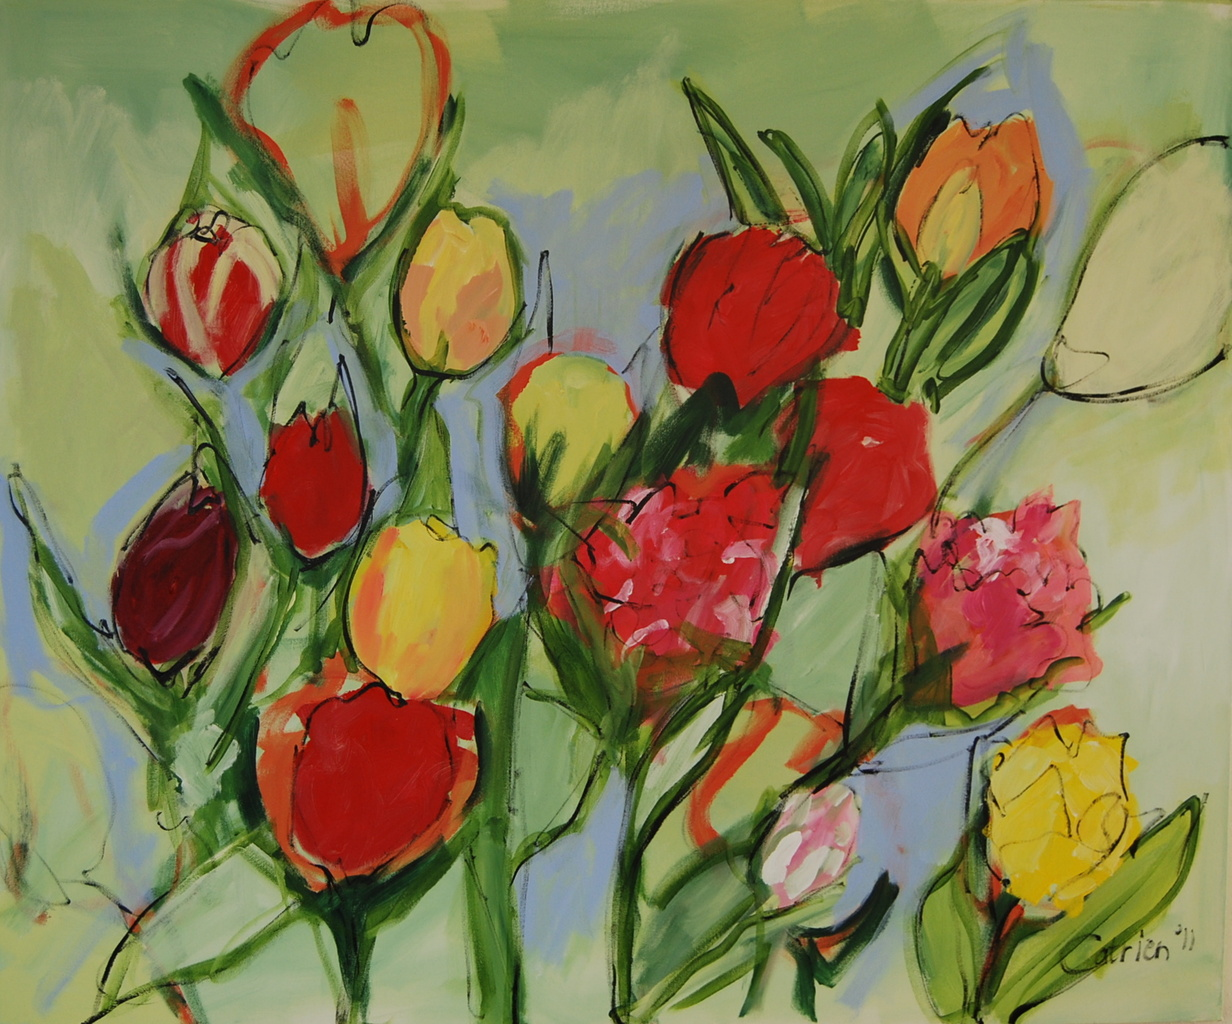 Catrien Art_Schilderij verkocht_Tulpen